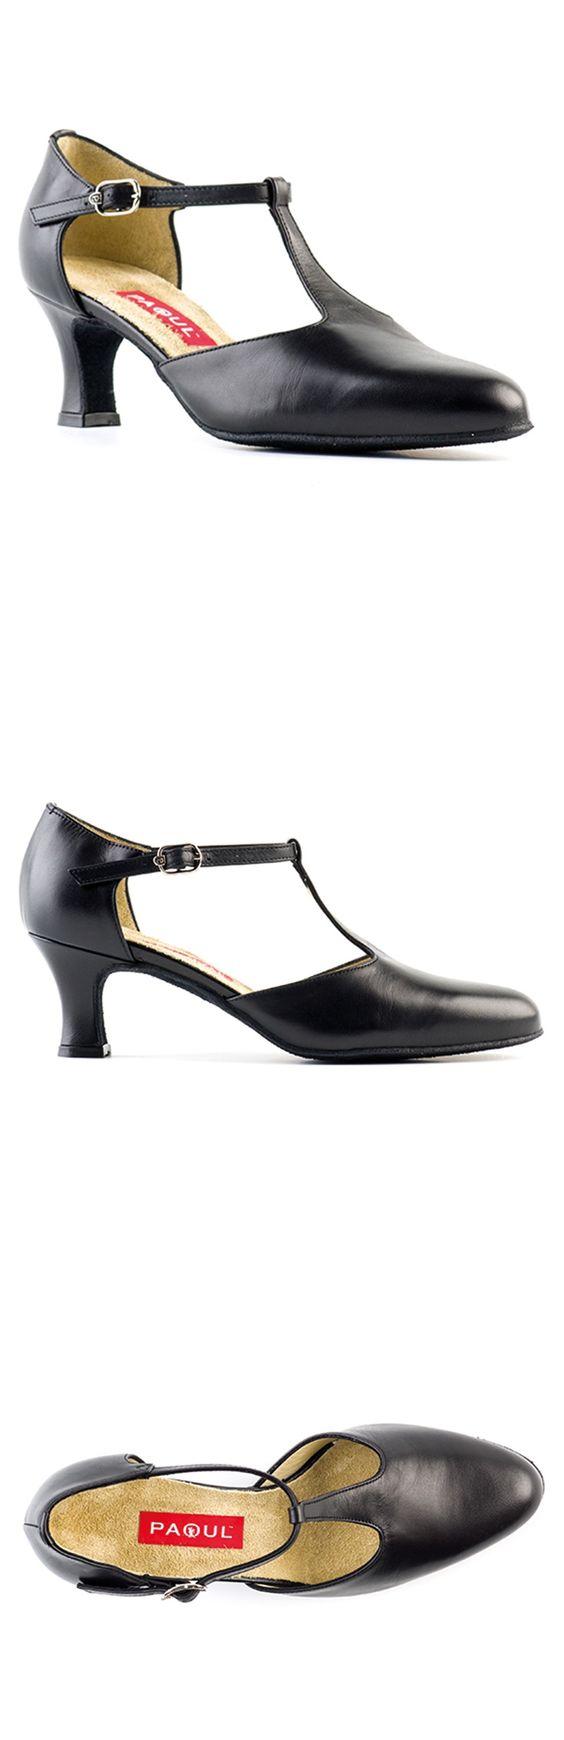 CHARLESTON #NERO 5_60T, ballo sociale ----- #BLACK CHARLESTON 5_60T, social dancing ----- #Paoul #womanshoes #danceshoes #scarpedaballo #ballosociale #dancingshoes #dance #ballo #socialdancing